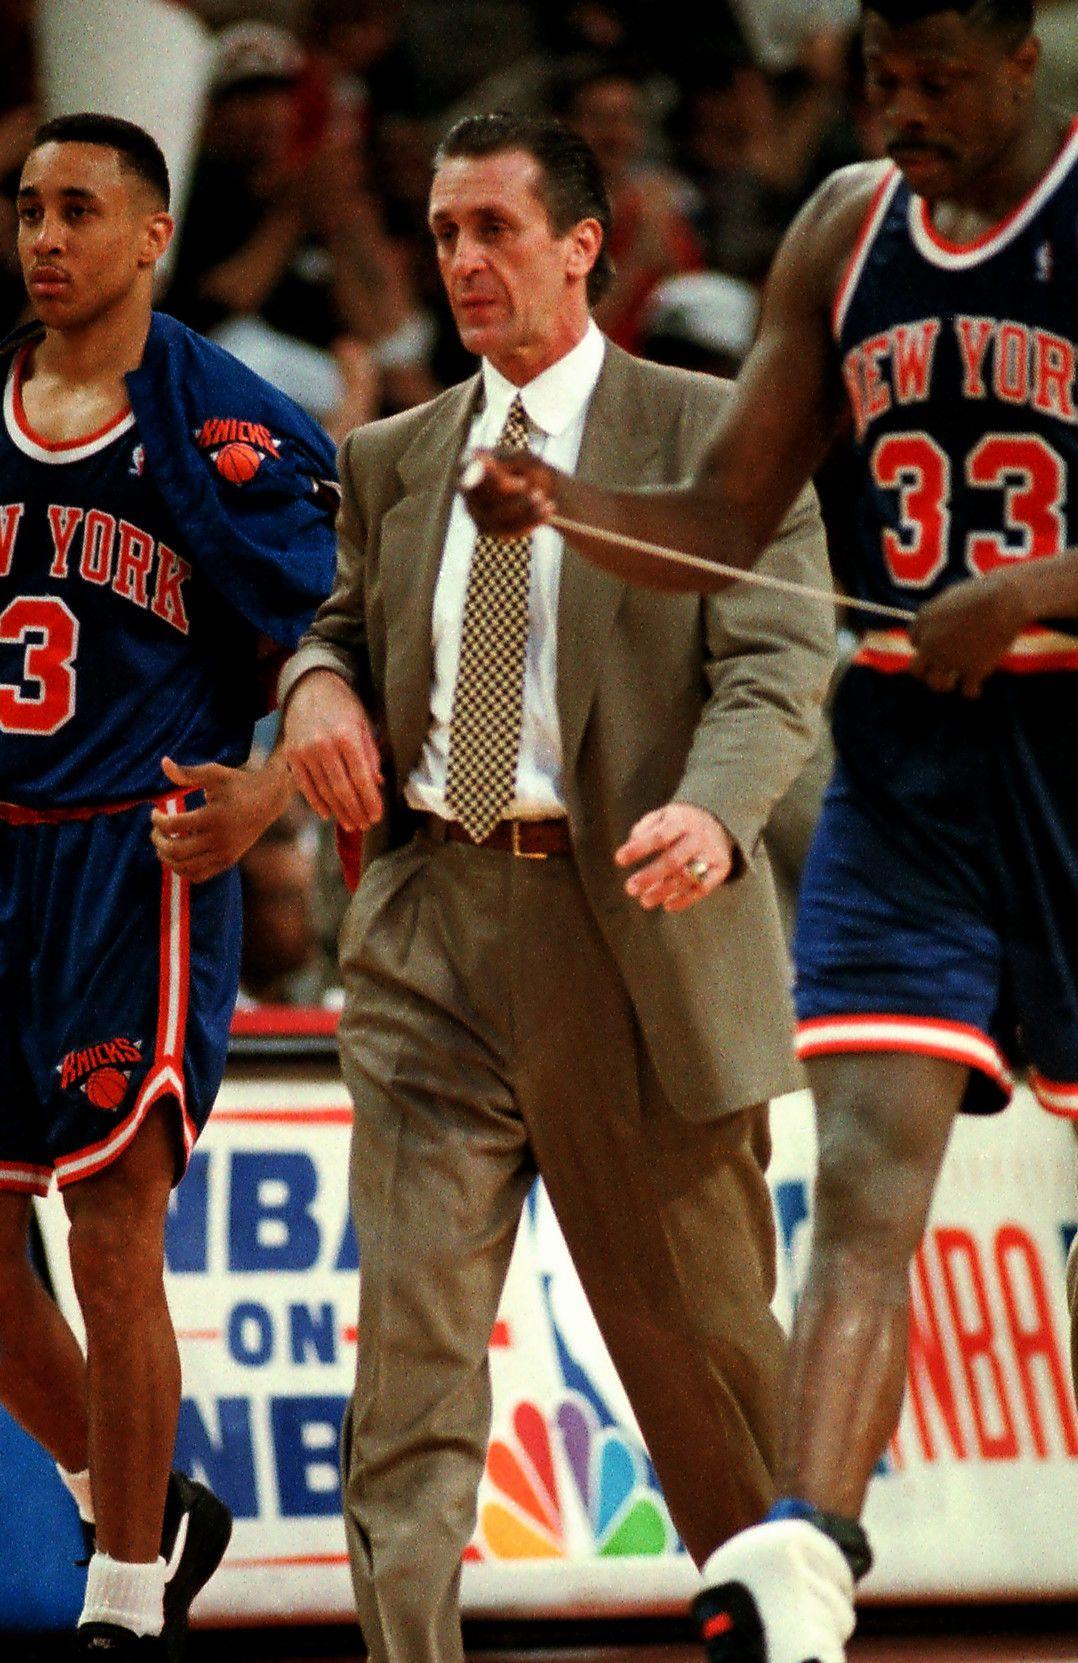 Nba Basketball New York Knicks: John Starks, Pat Riley & Patrick Ewing Www.kingsofsports